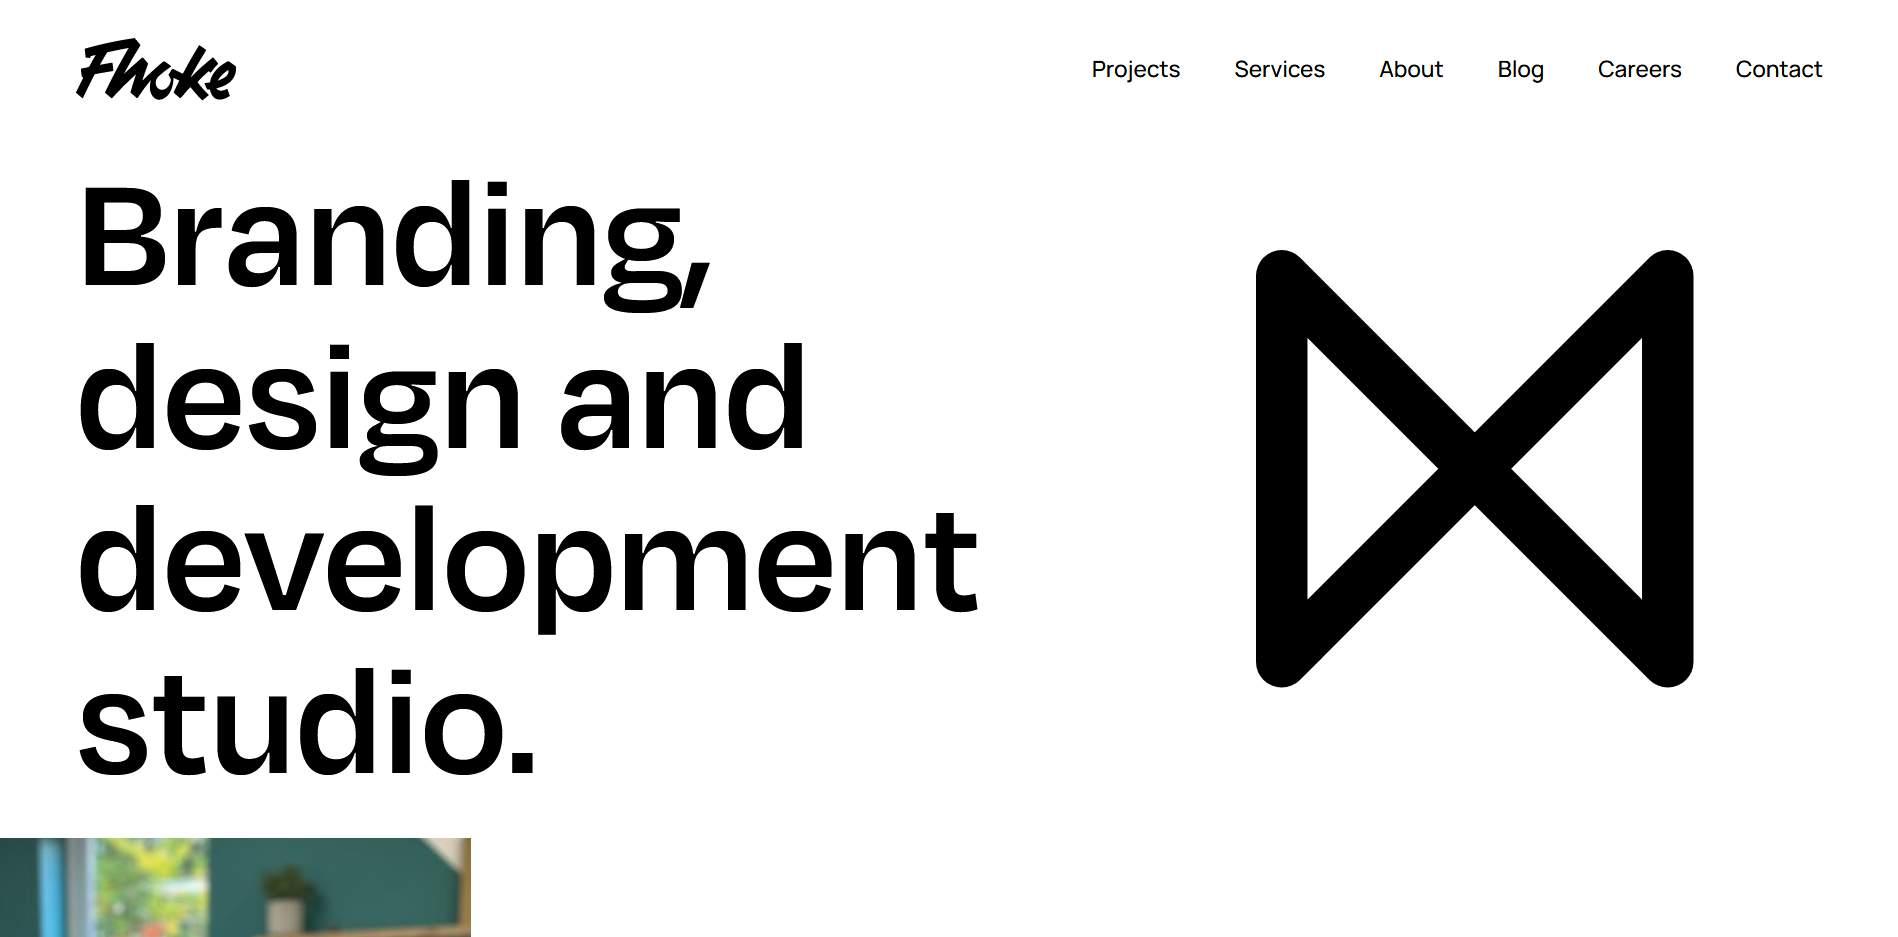 Fhoke's website homepage.